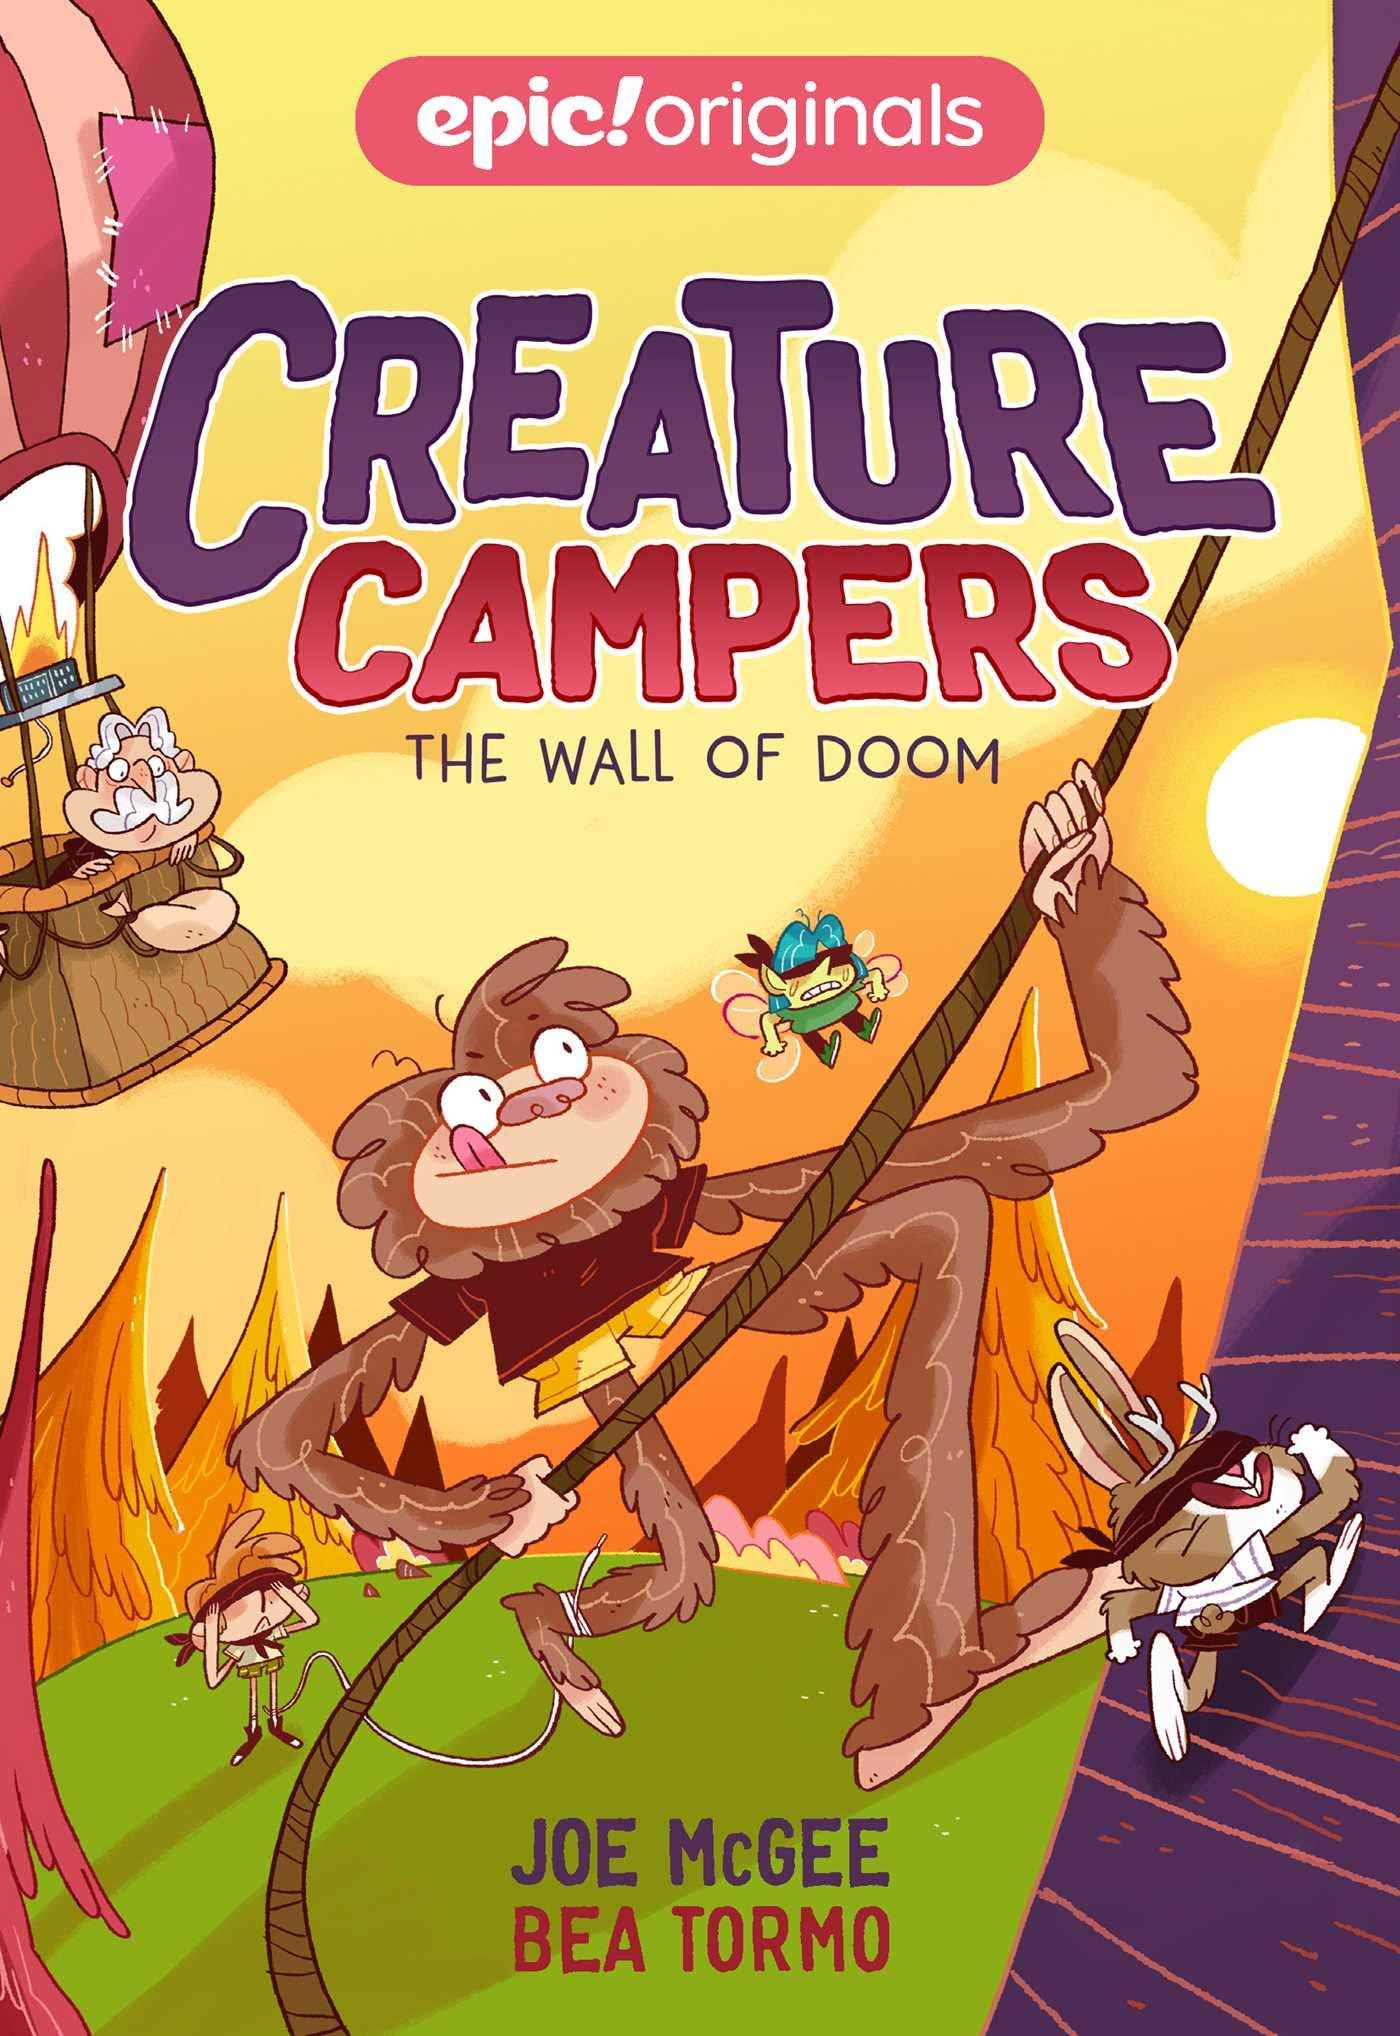 Amazon Com The Wall Of Doom Volume 3 Creature Campers 9781524860905 Mcgee Joe Tormo Bea Books